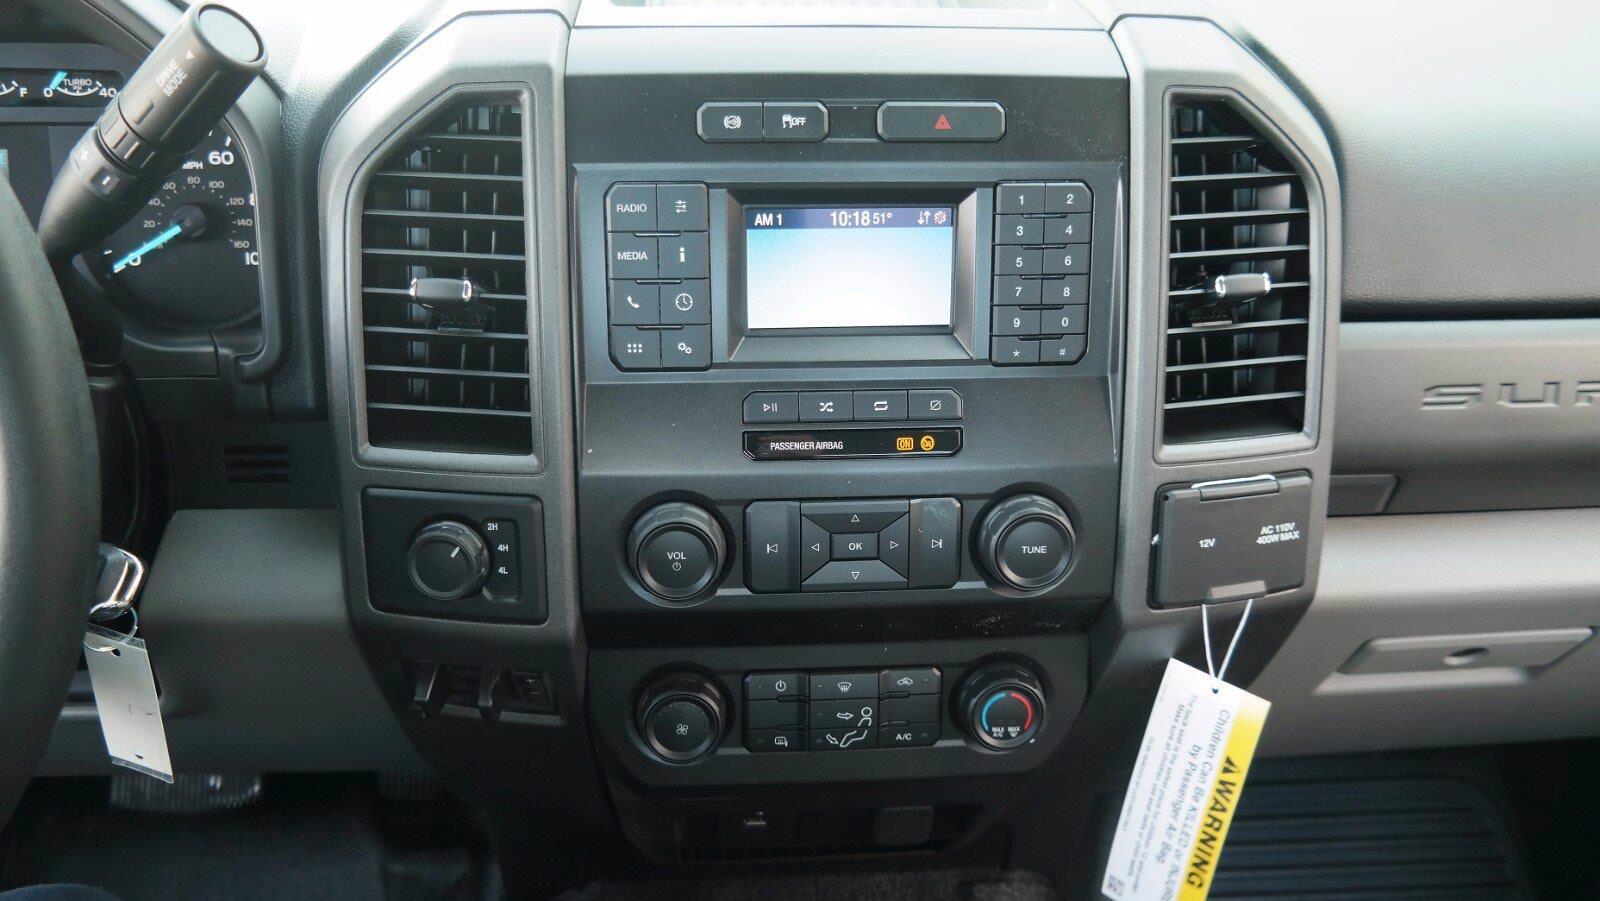 2021 Ford F-600 Regular Cab DRW 4x4, Cab Chassis #FLU10124 - photo 12